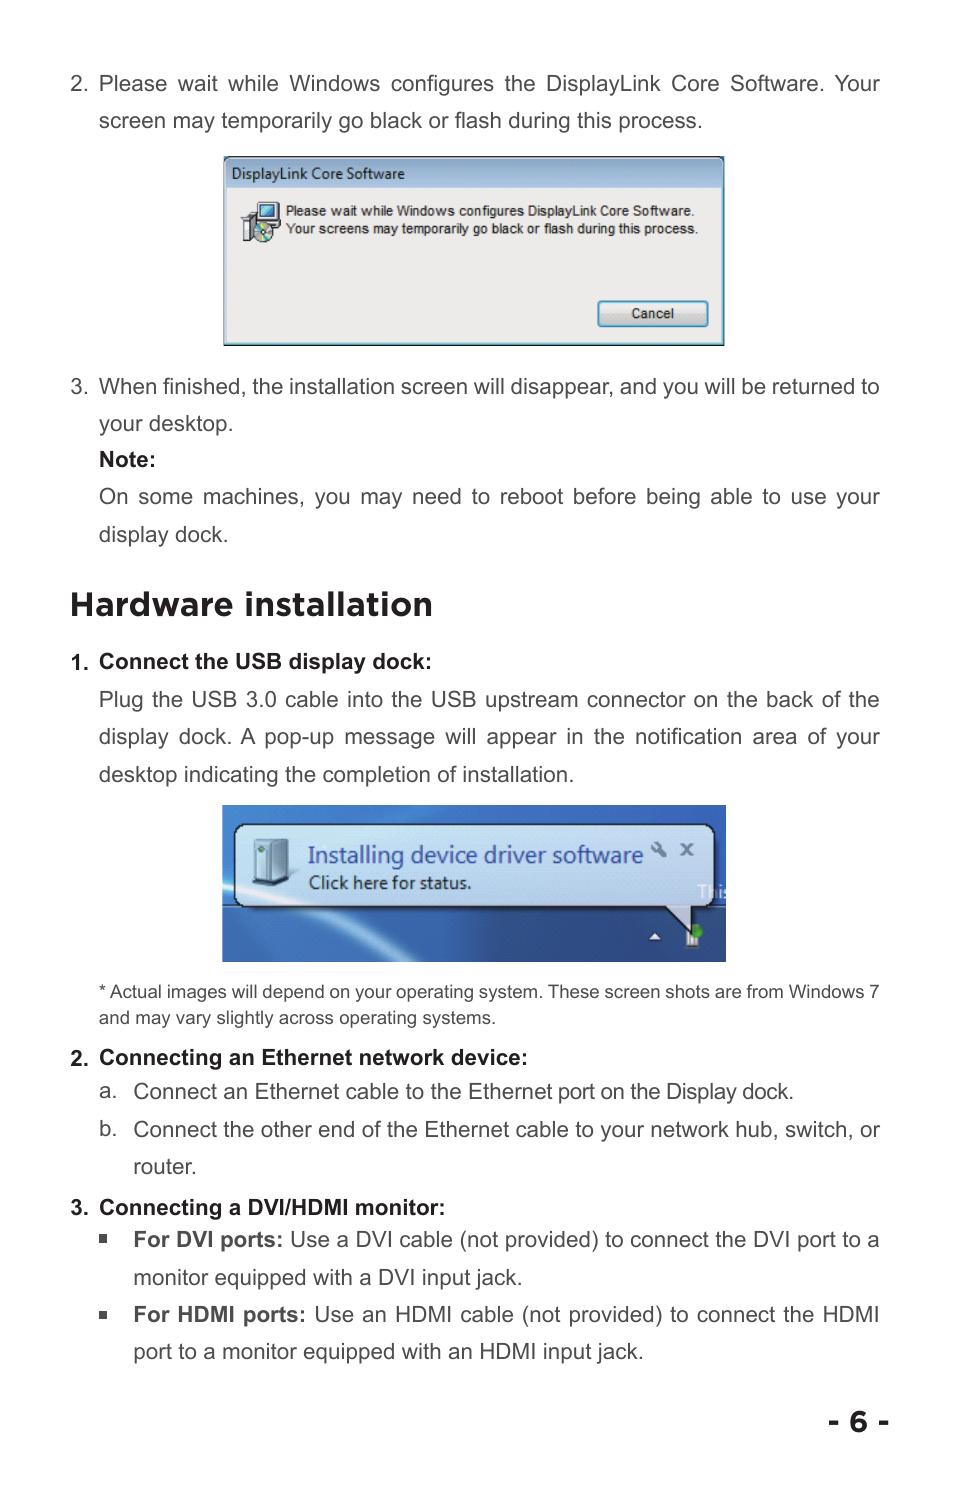 Hardware Installation